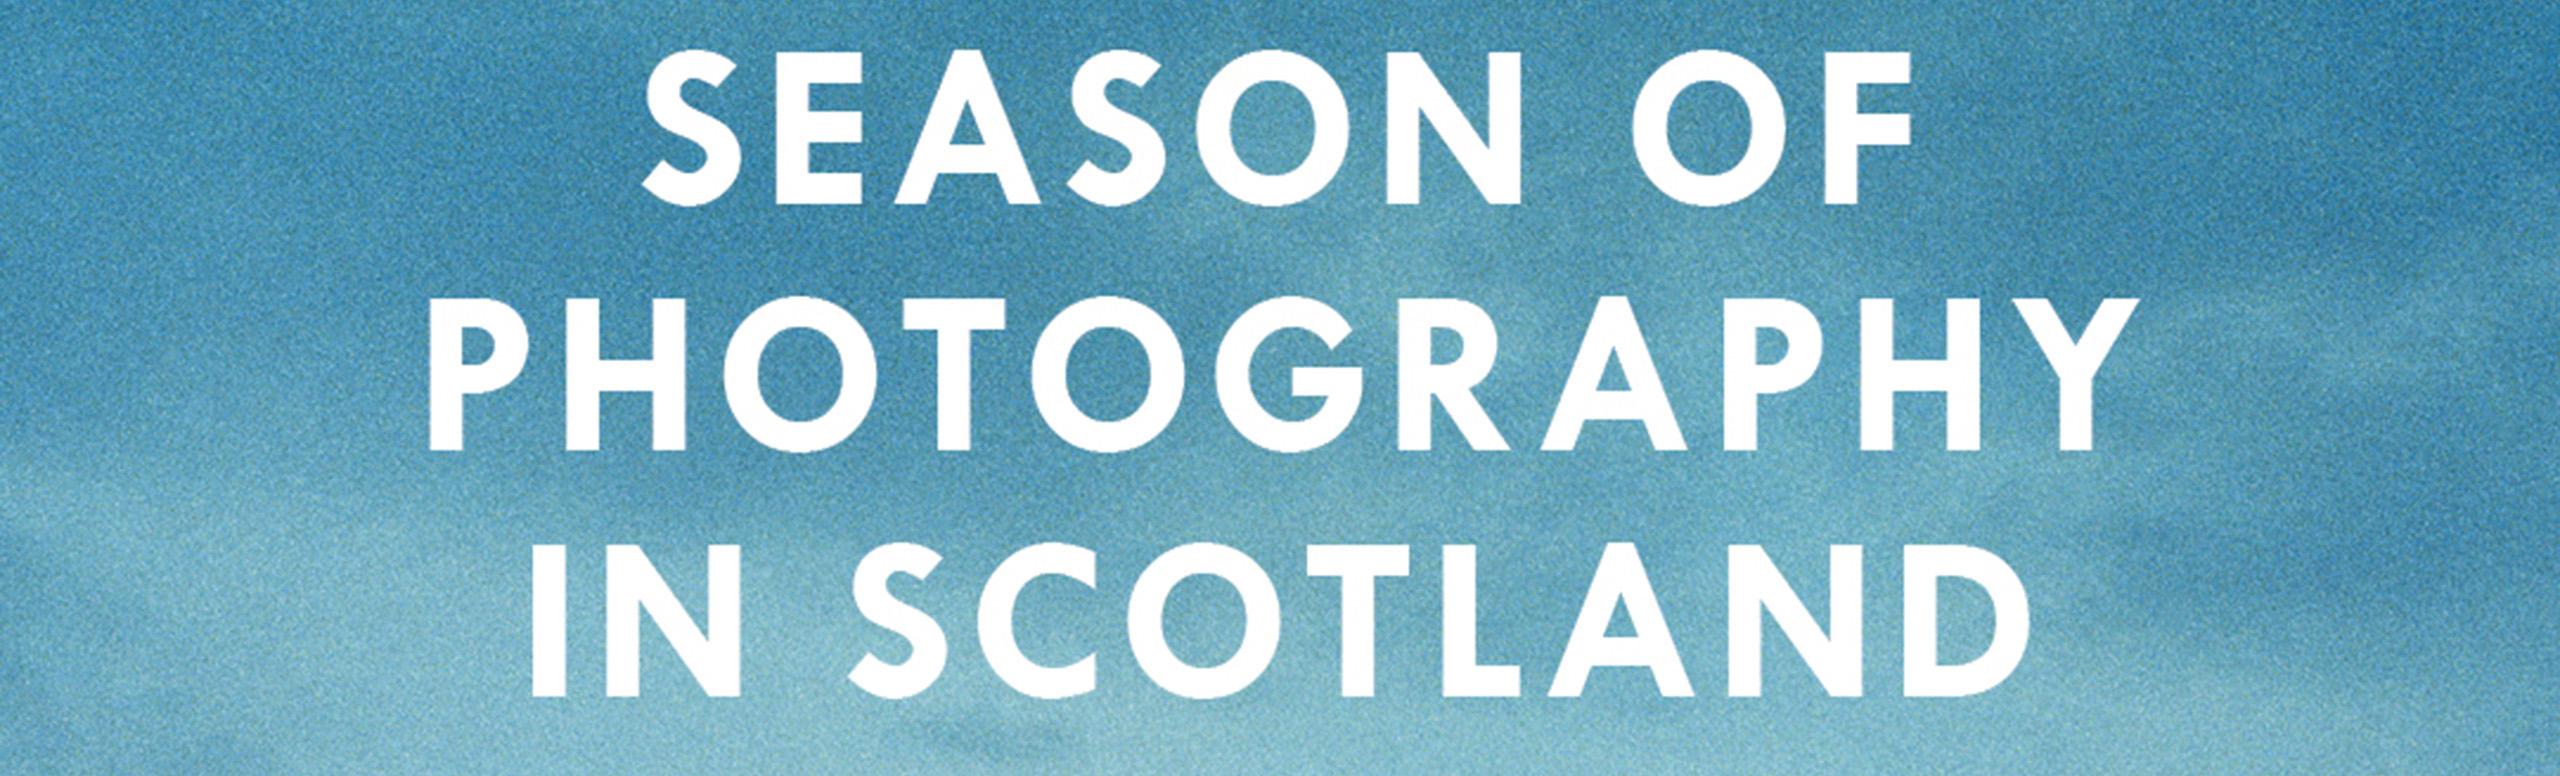 Season of Photography 2016